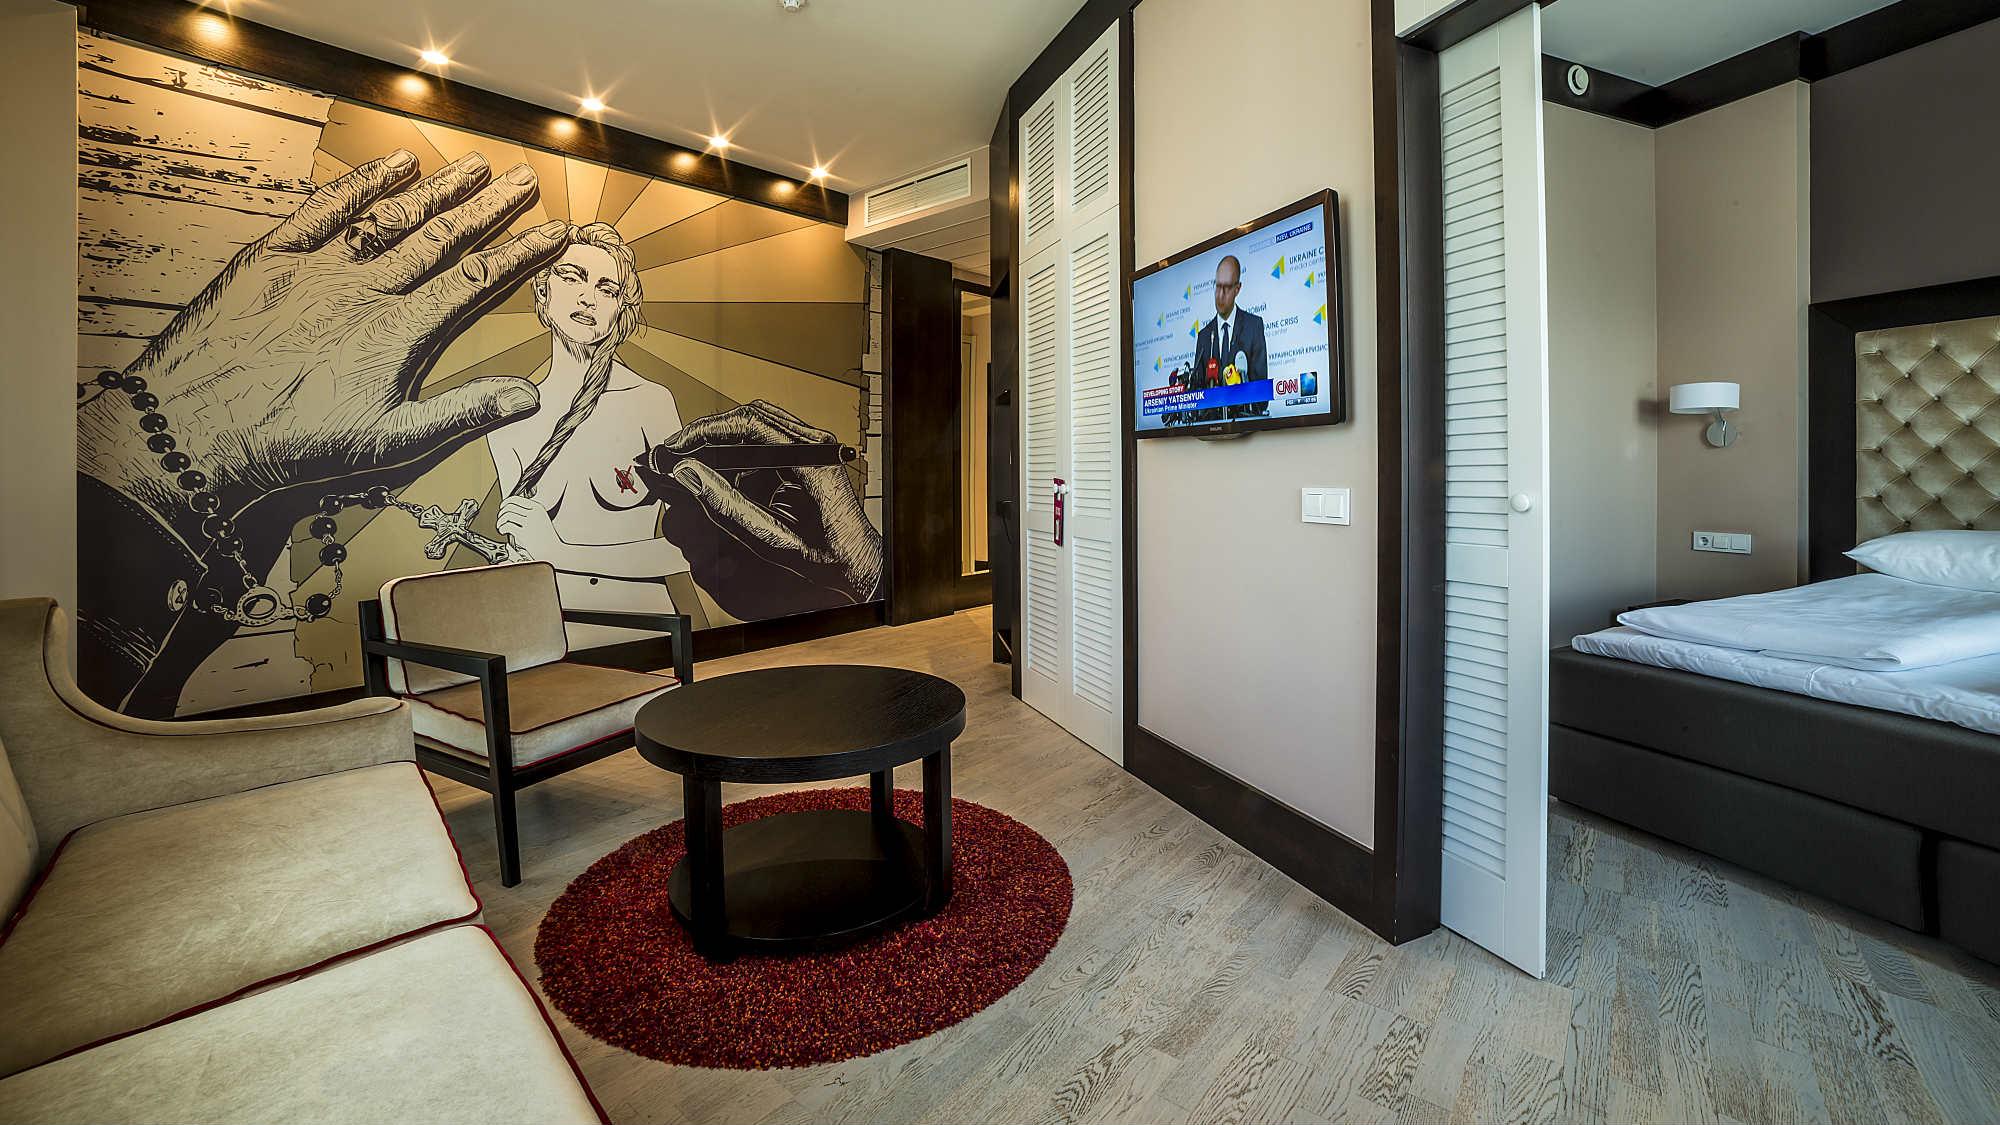 Фото отеля Comfort Hotel® LT № 21